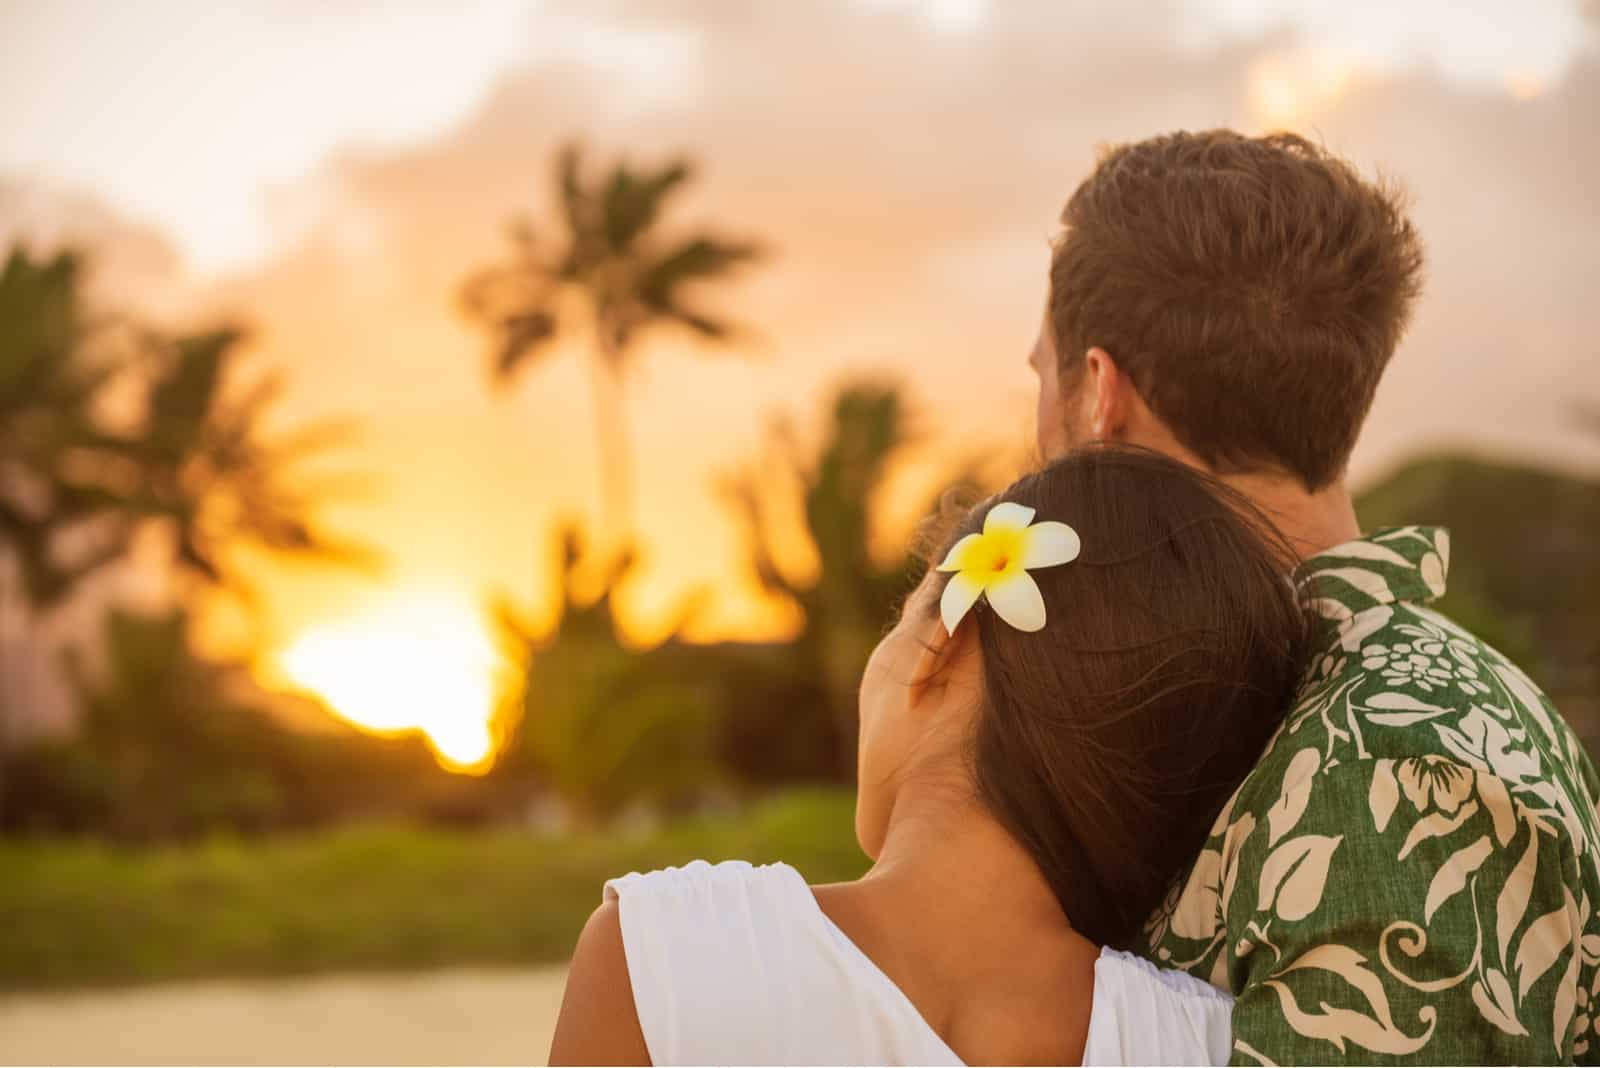 Romantisches Paar entspannt den Sonnenuntergang am Strand beobachten